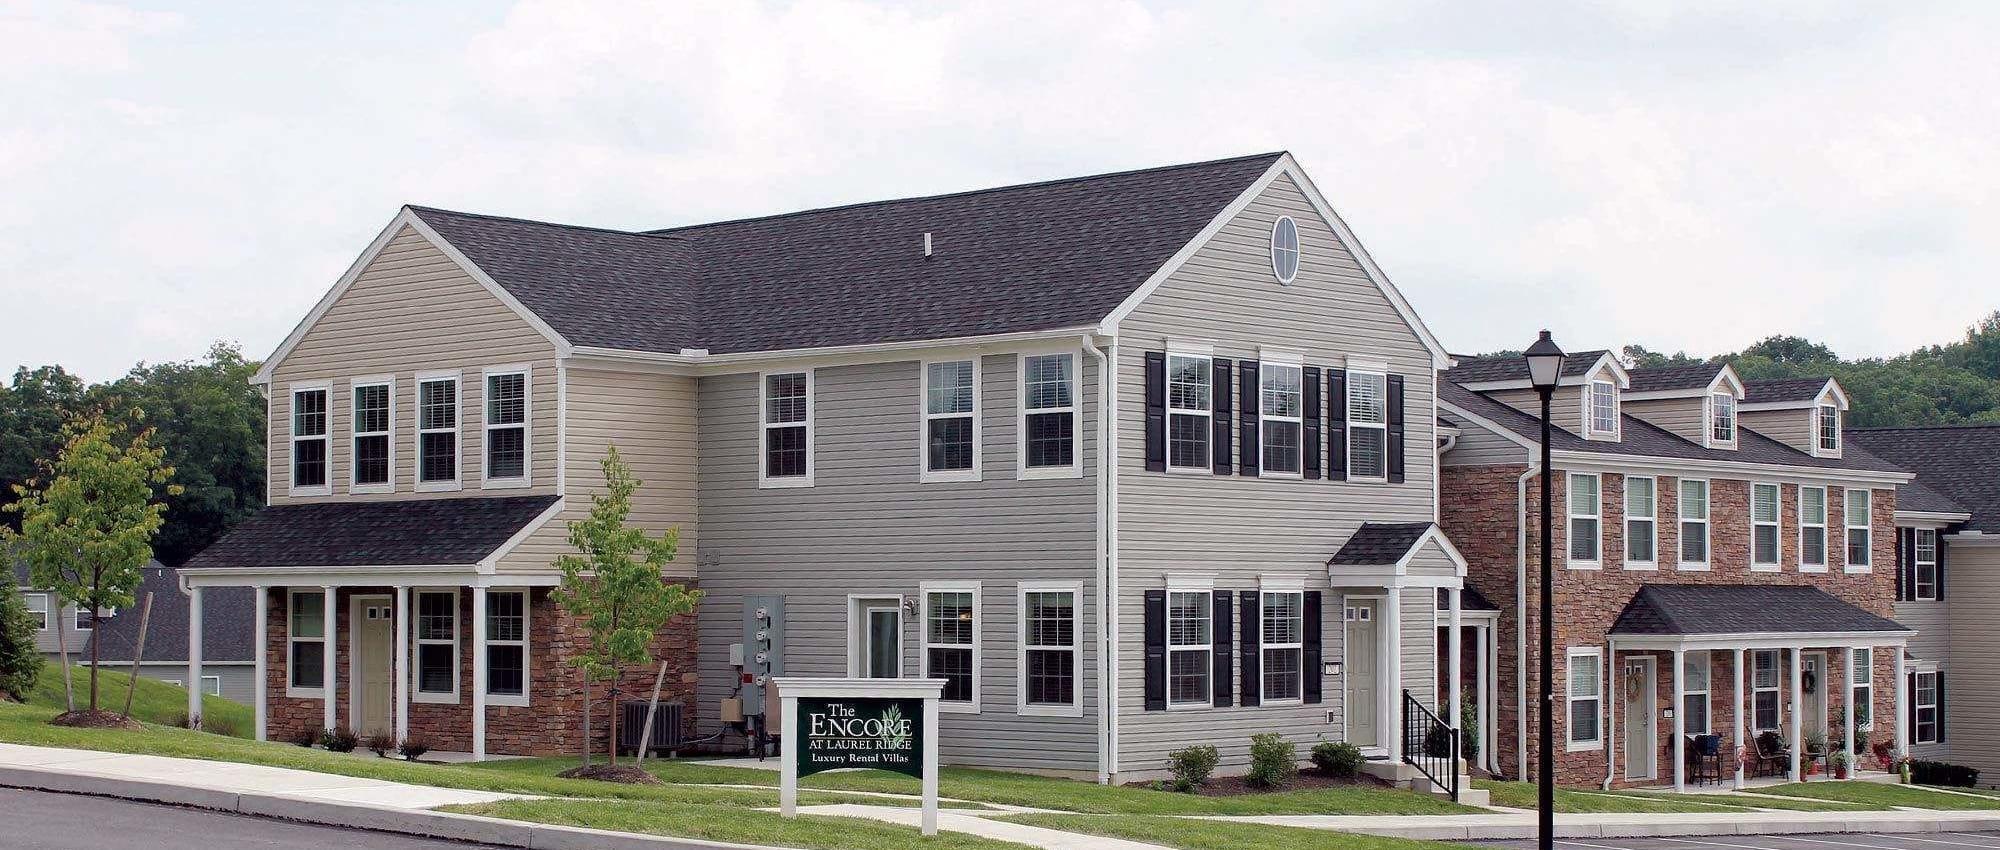 Apartments at The Encore at Laurel Ridge in Harrisburg, Pennsylvania